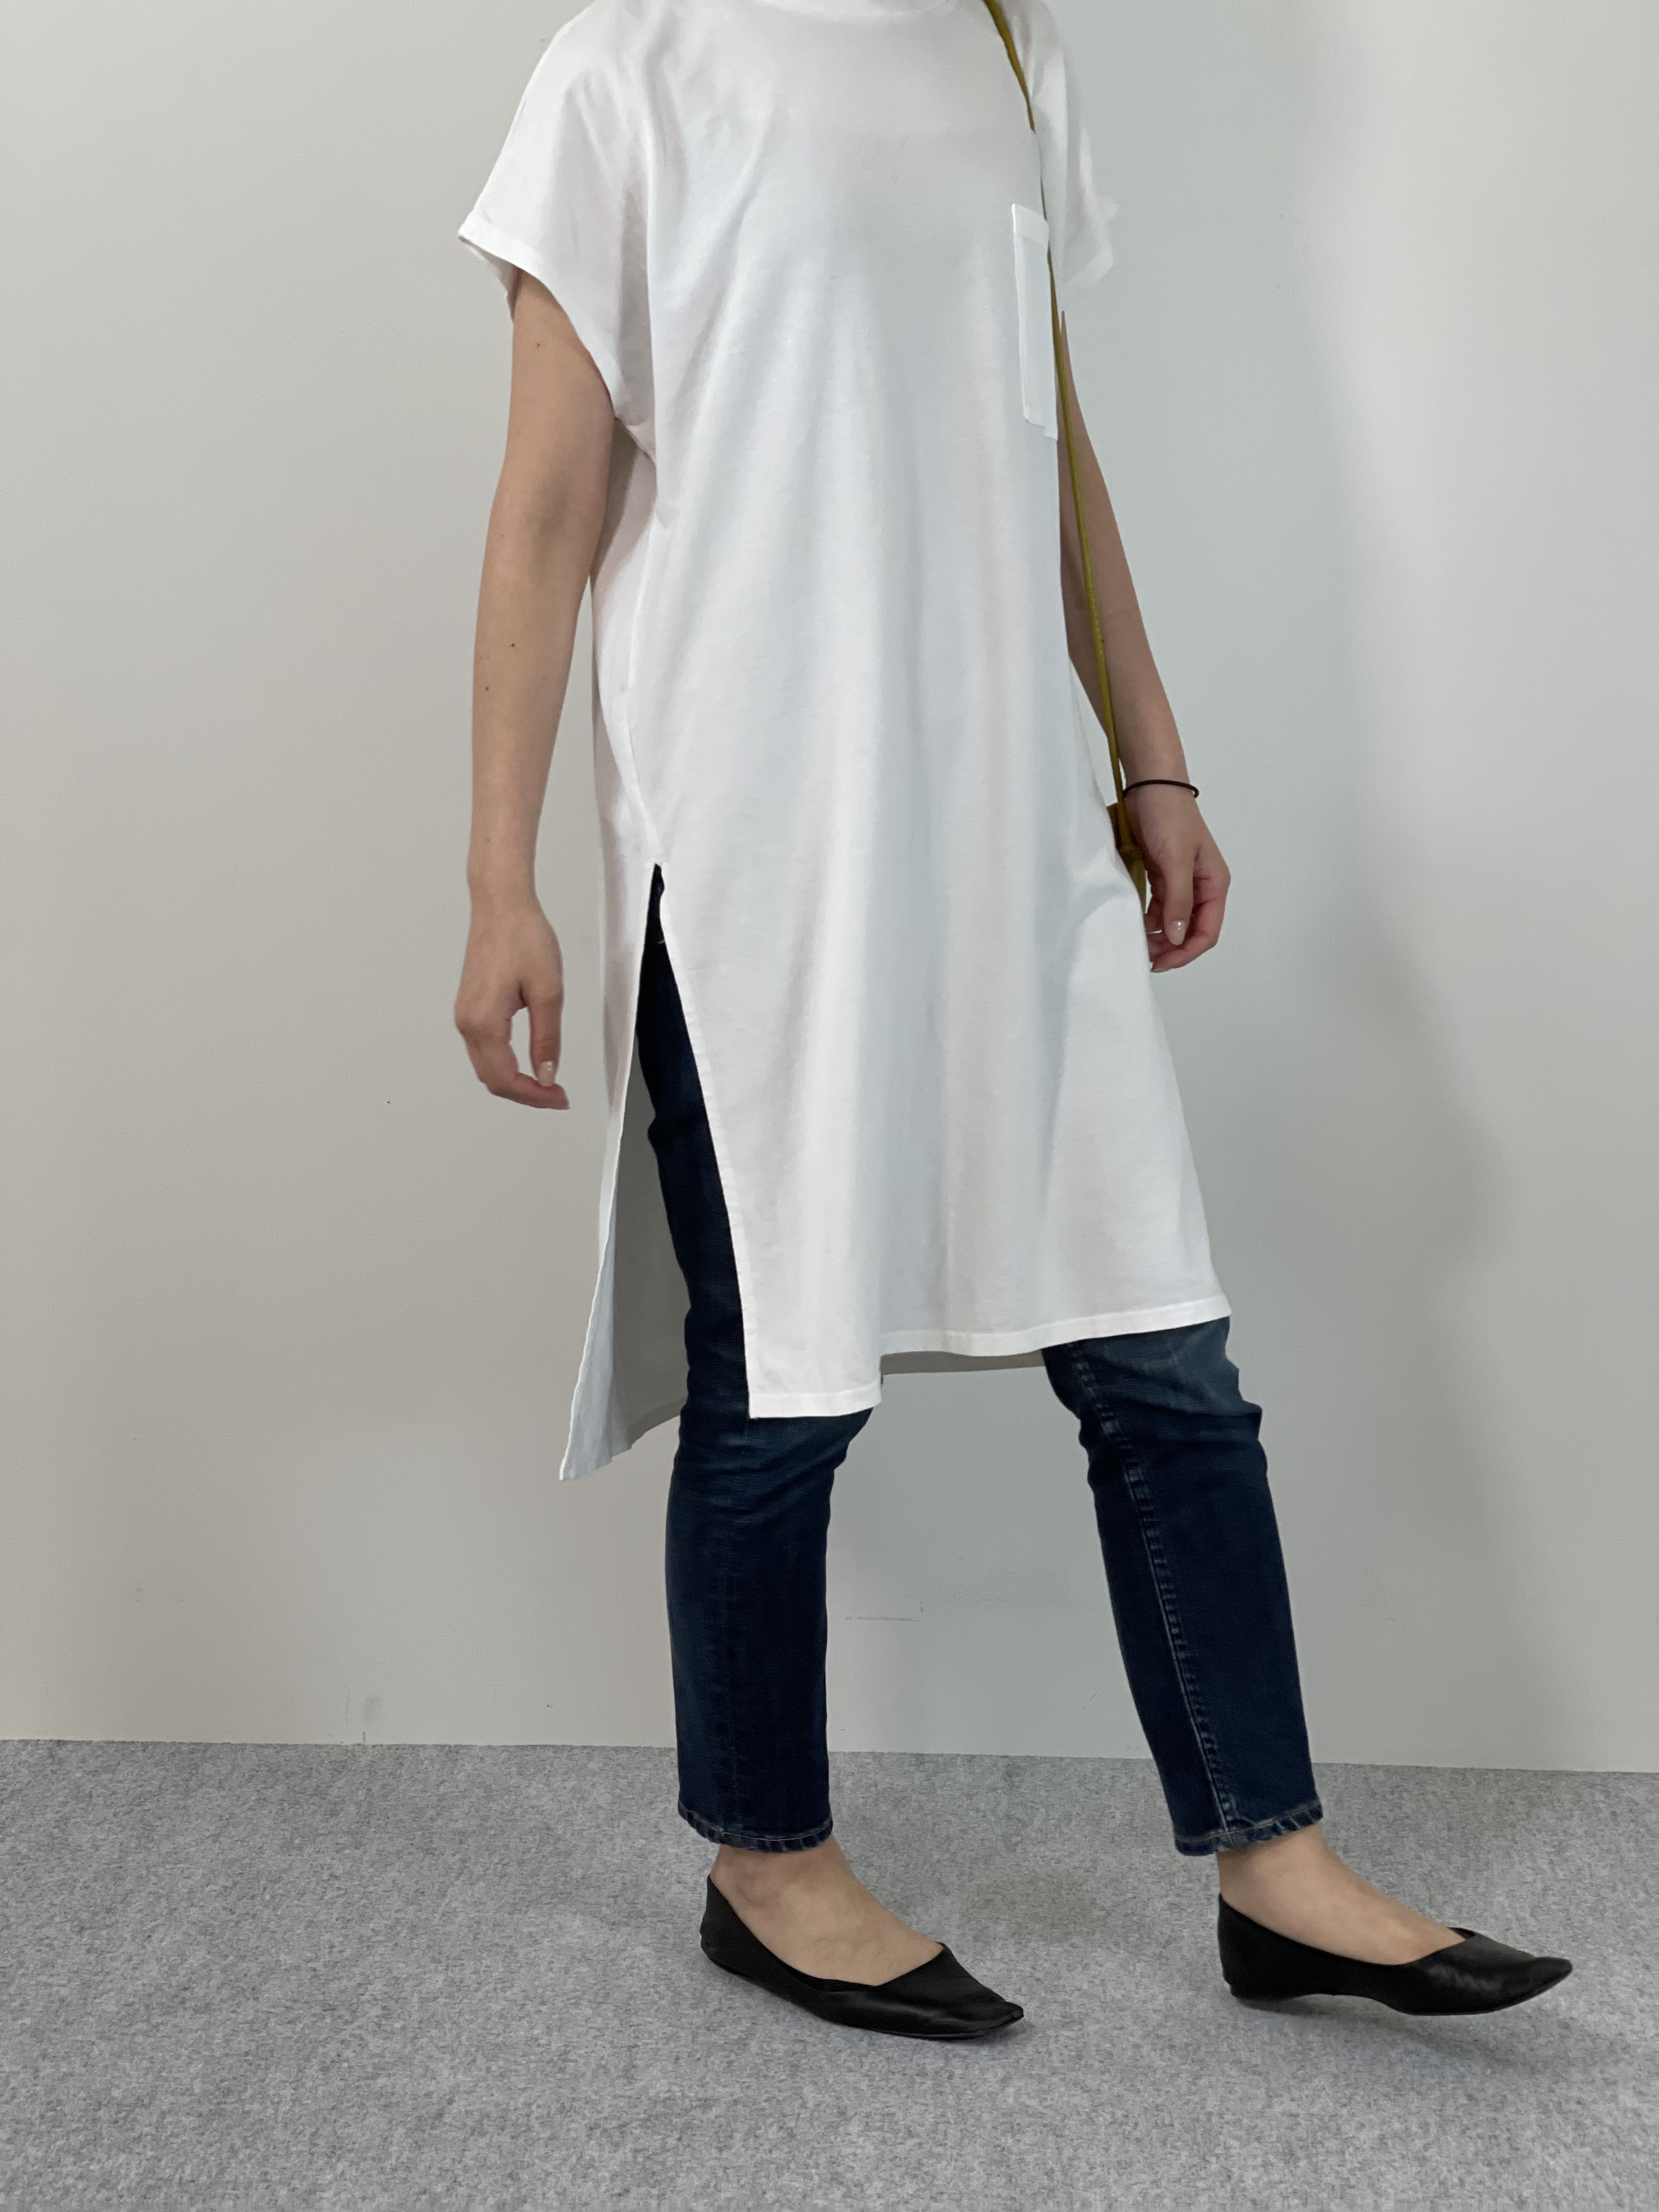 Women's COMFORT DRESS TUNIC T-SHIRTの着用画像0